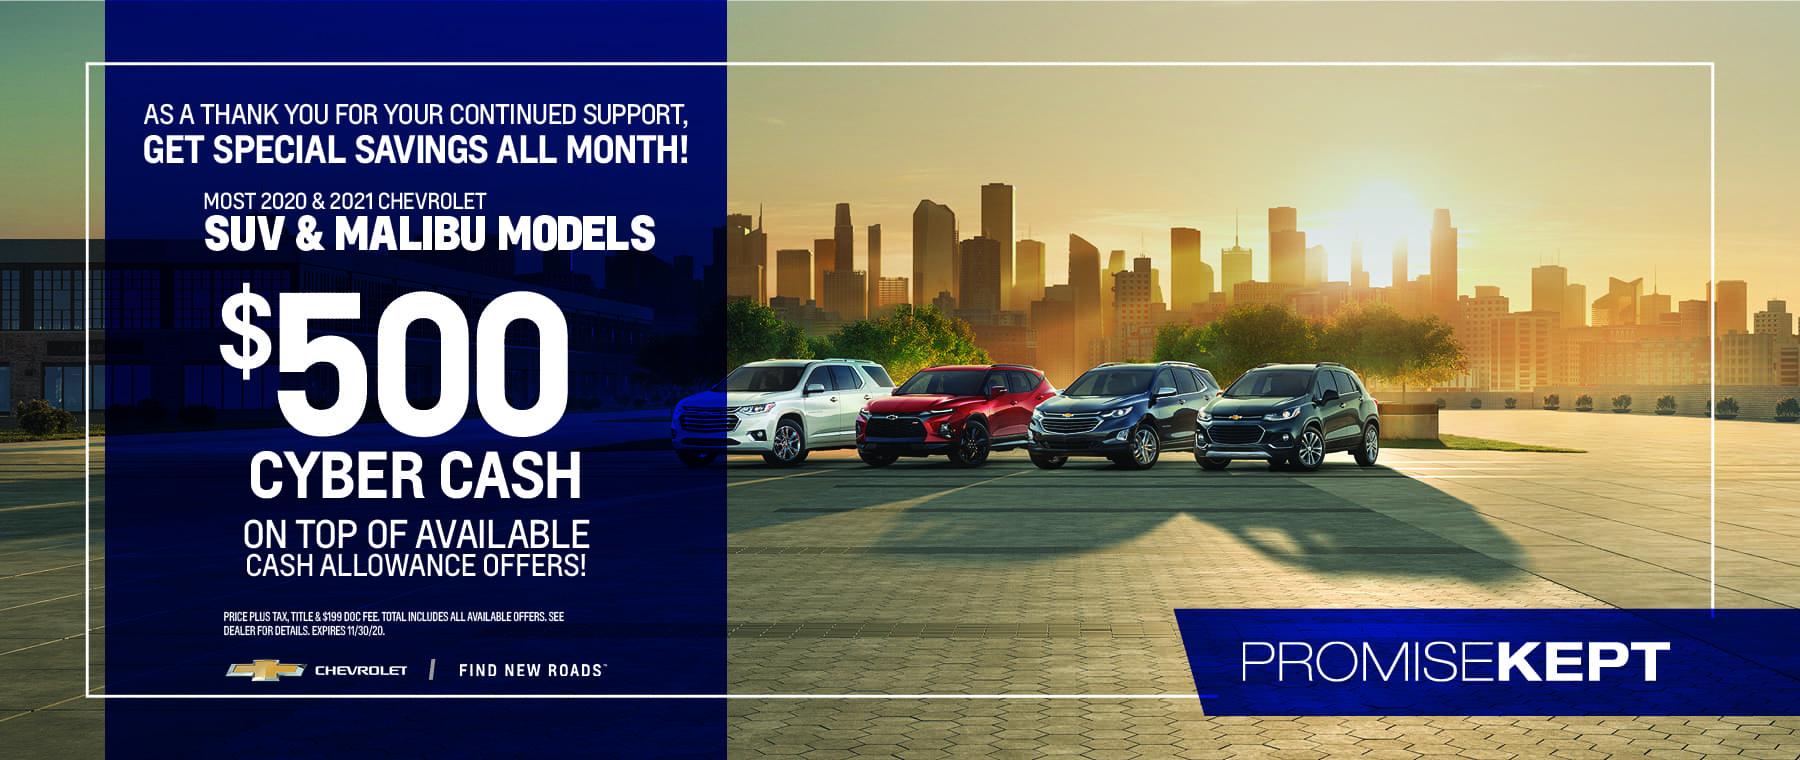 $500 Cyber Cash on SUV & Malibu models